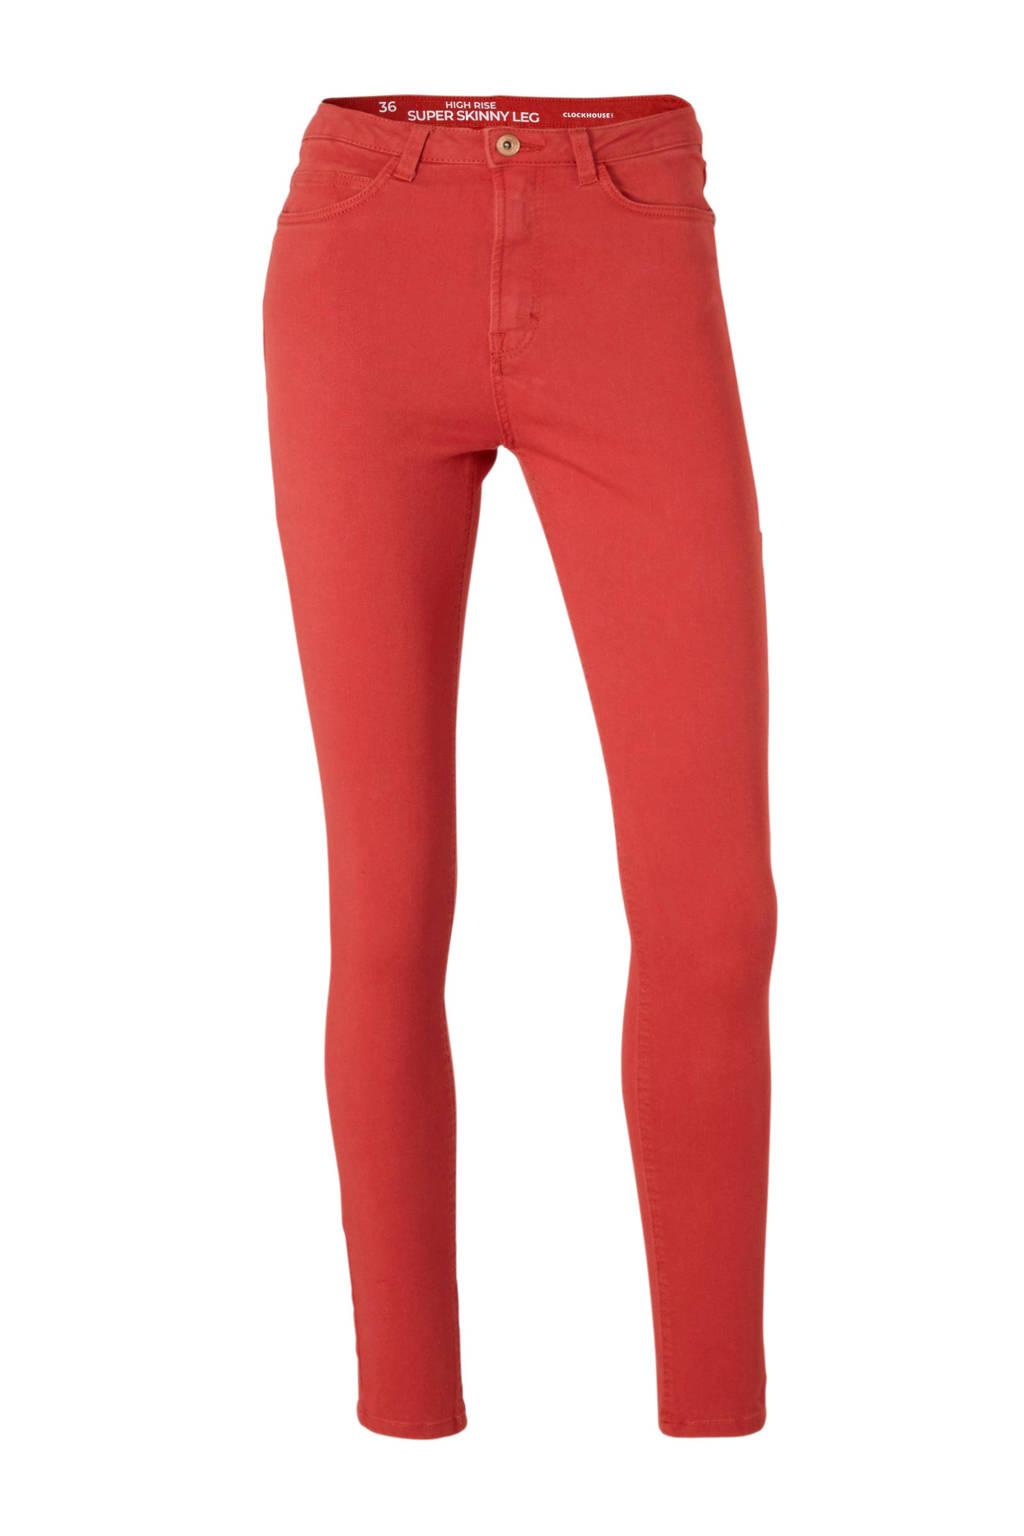 C&A Clockhouse high waist skinny jeans, Rood